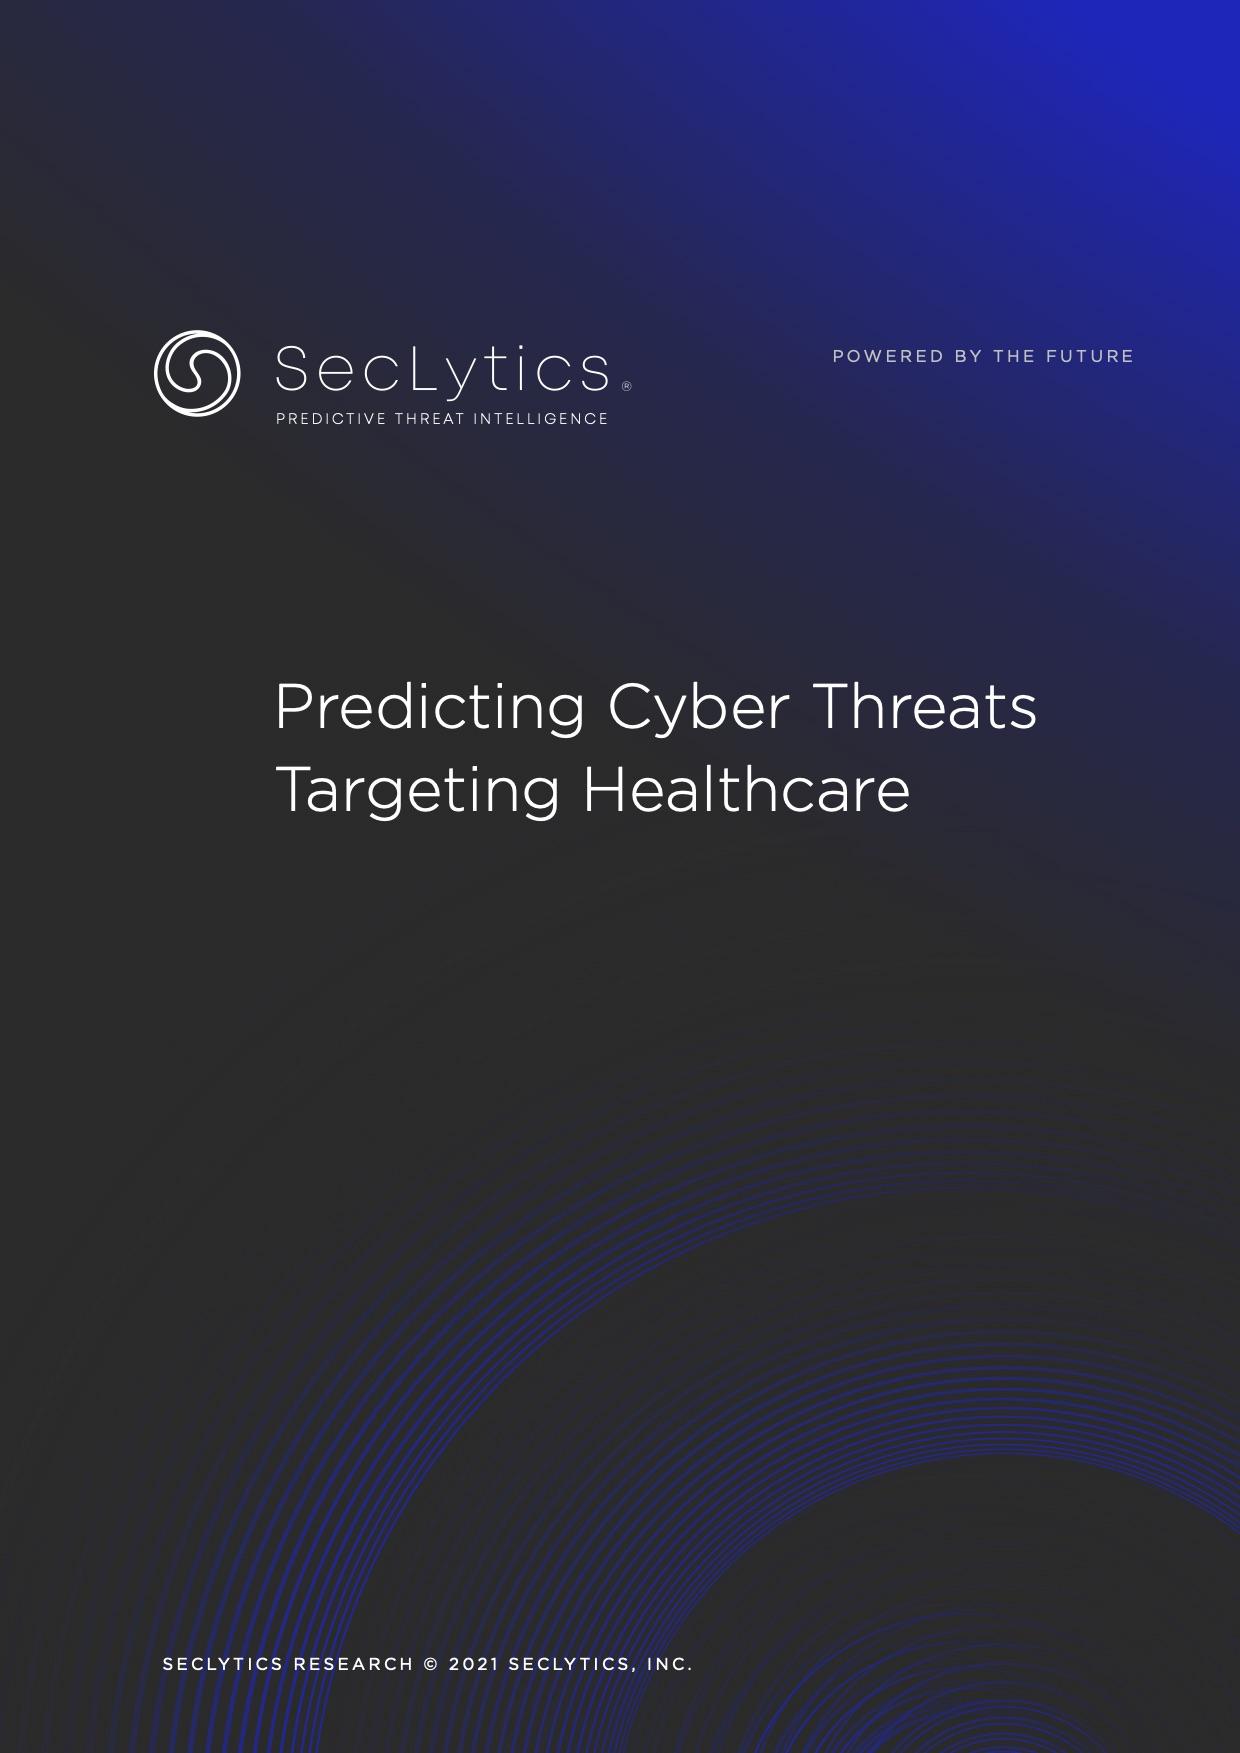 Predictive Cyber Threats Targeting Healthcare